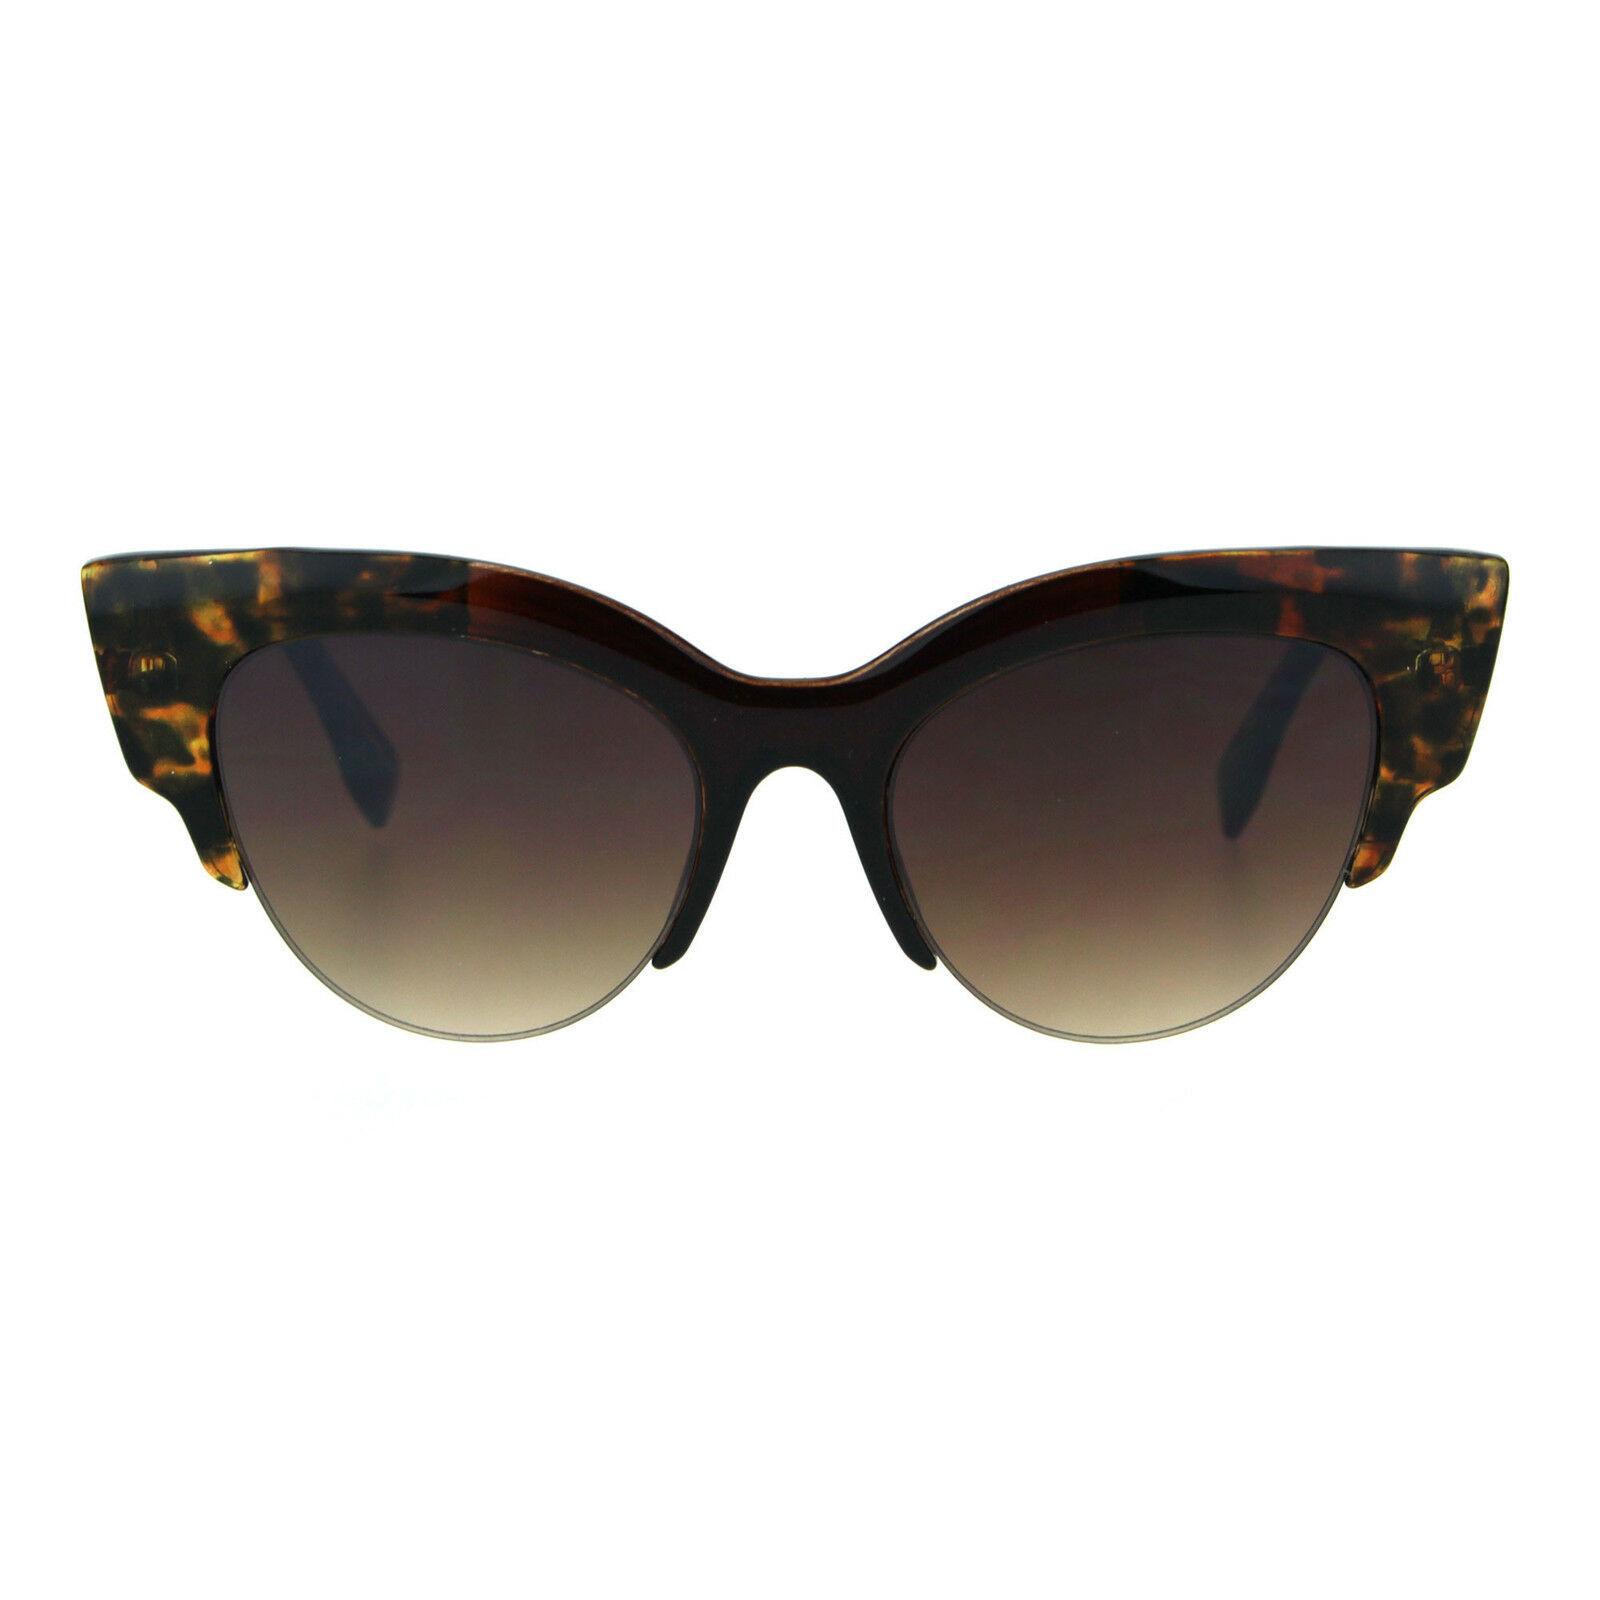 Womens Gothic Thick Plastic Cat Eye Half Horn Rim Retro Sunglasses